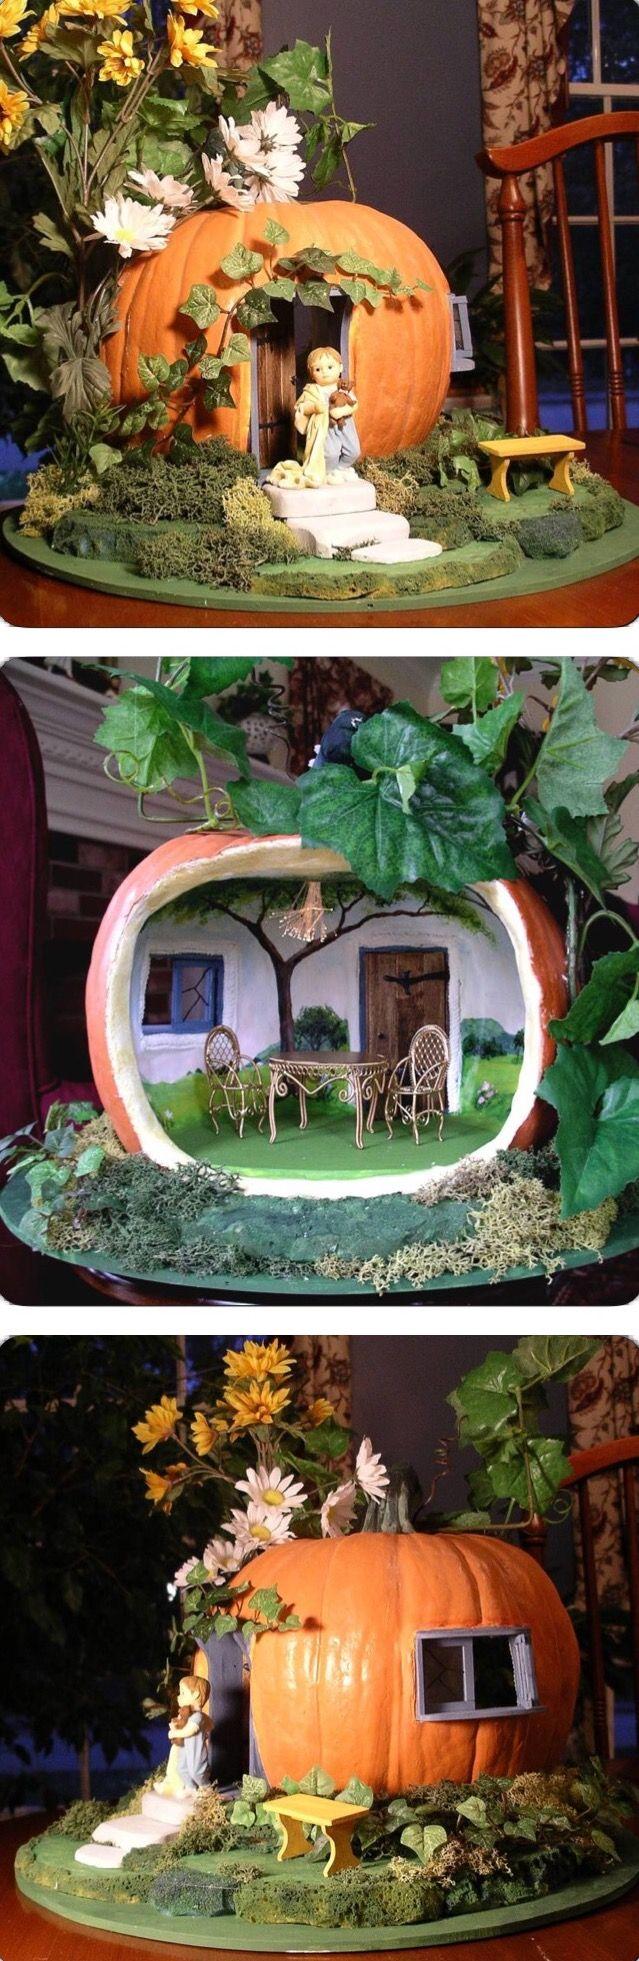 ADORABLE PUMPKIN HOUSE fairy garden! ~ The Pumpkin House from http://grazhina-pumpkin-house.blogspot.com/2008/06/what-to-do-with-styrofoam-pumpkin.html?m=1